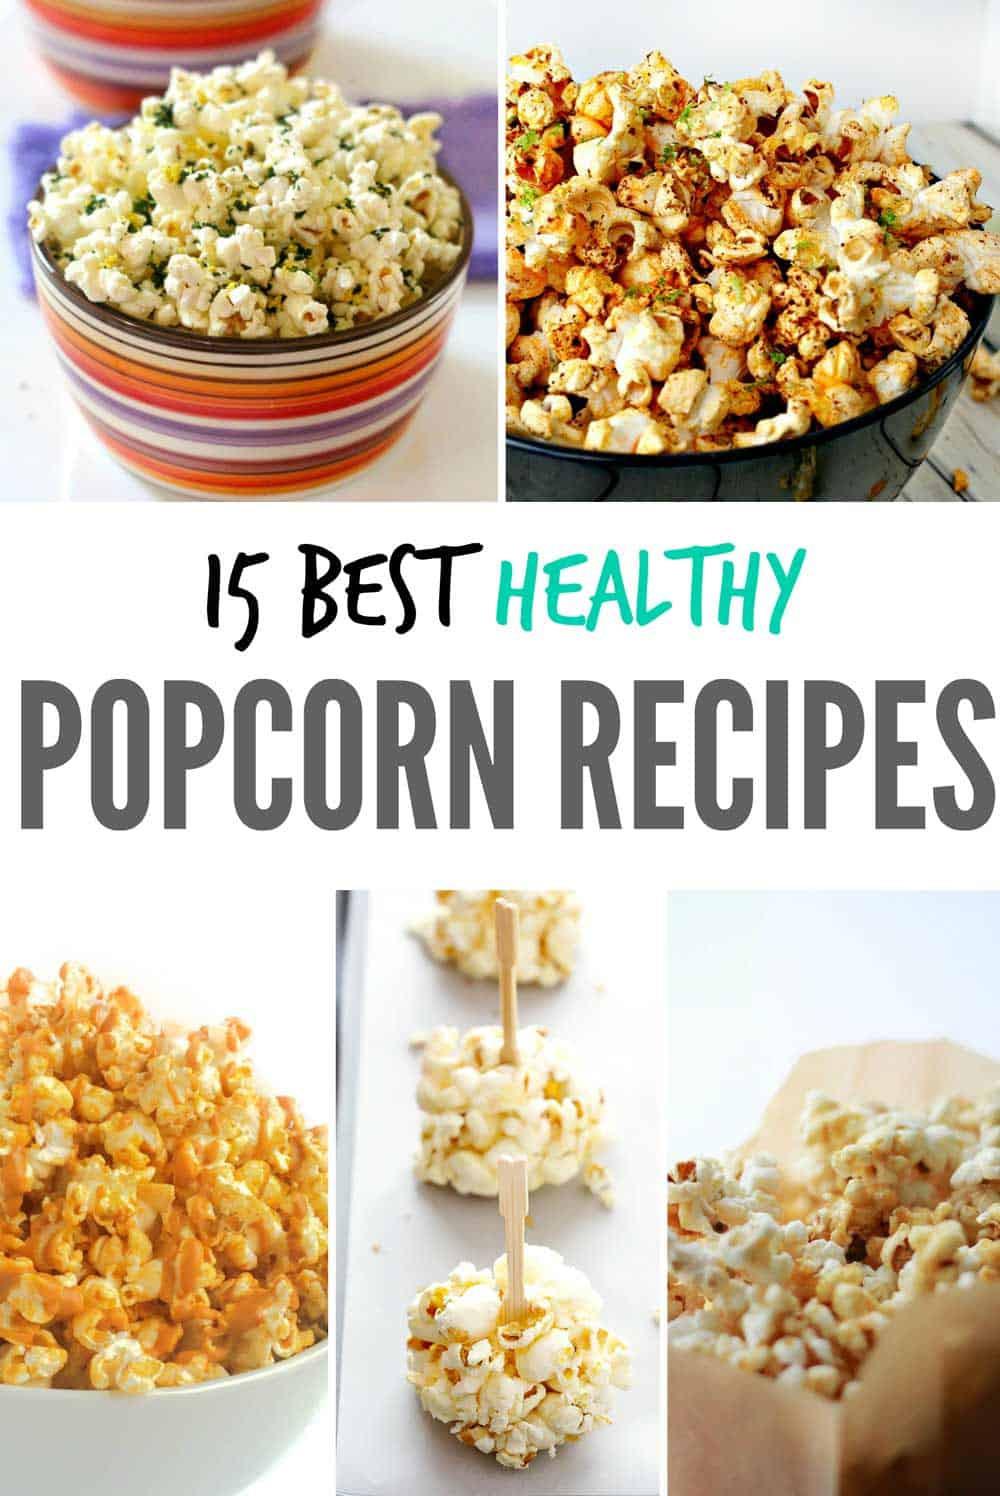 Healthy Popcorn Snacks 20 Best Ideas Best Healthy Popcorn Recipes – Leelalicious